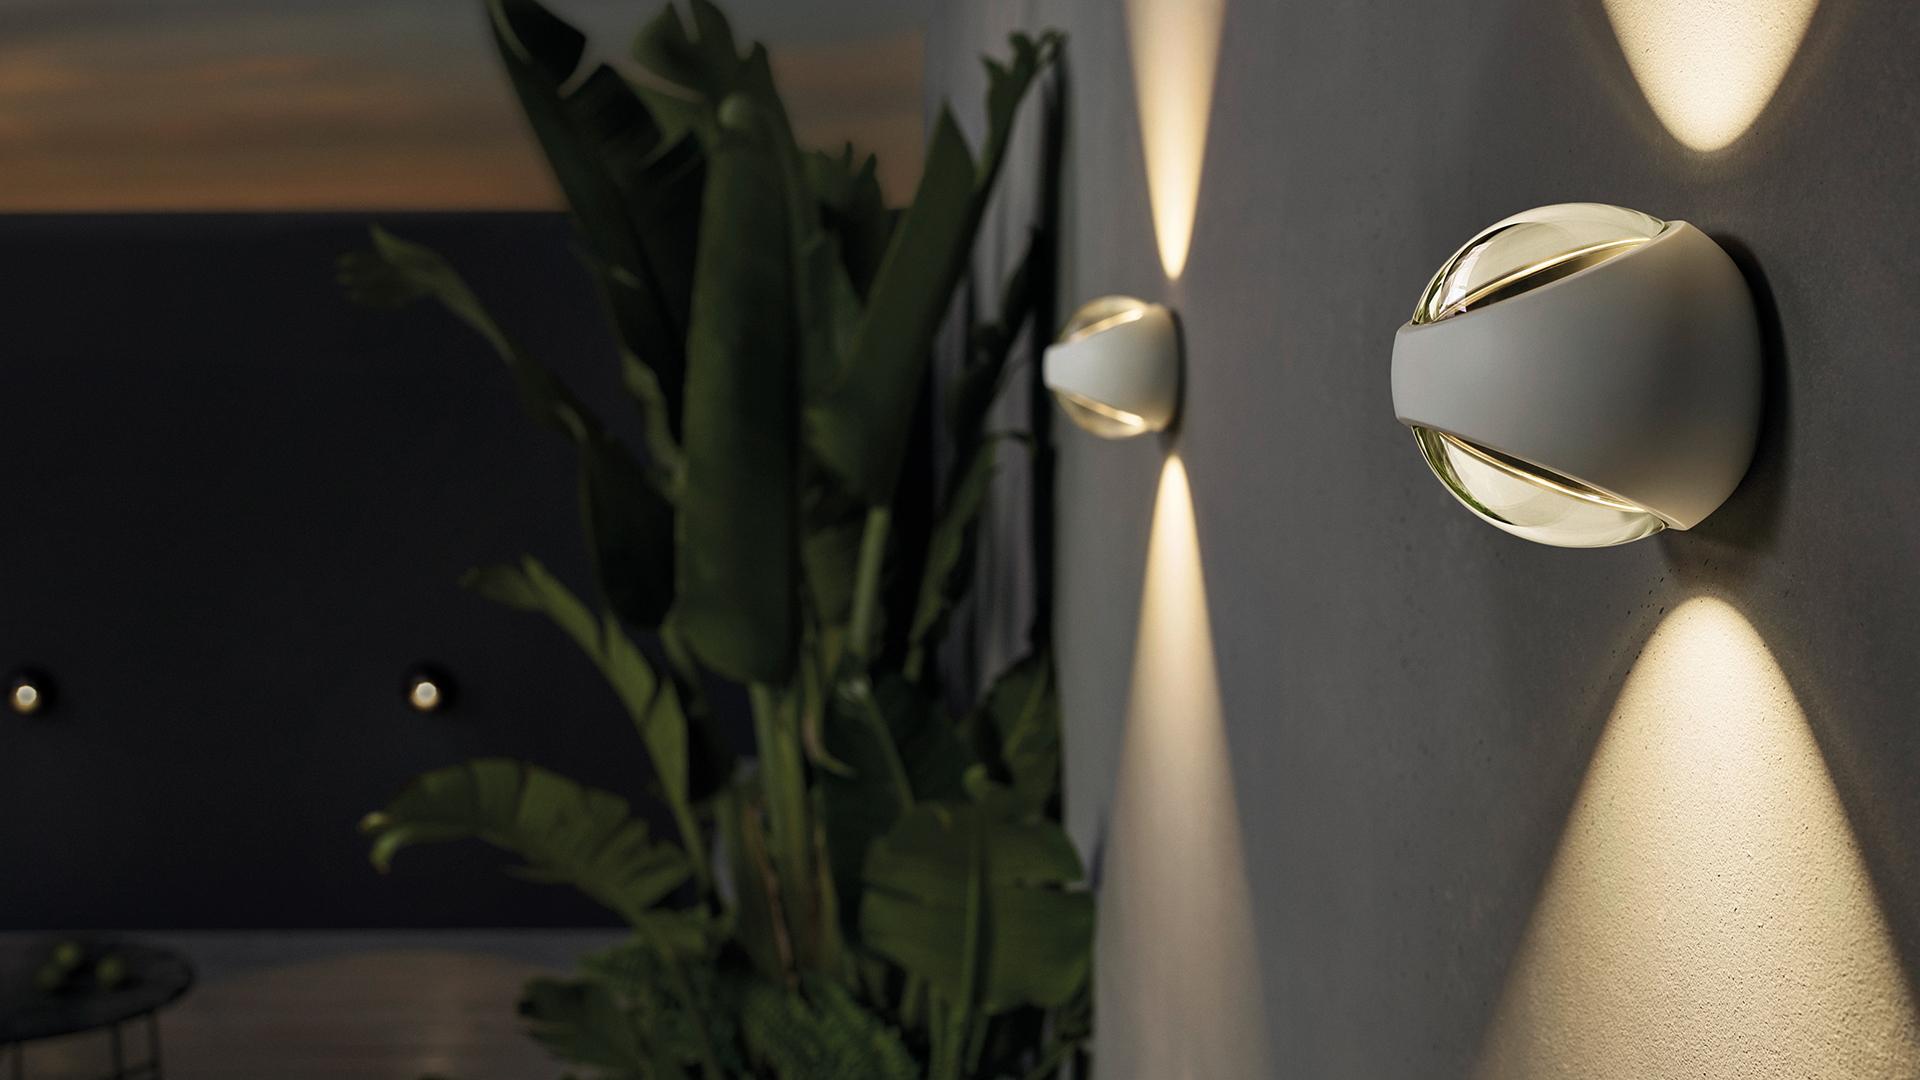 Sito Verticale Occhio | Hoogebeen Interieur